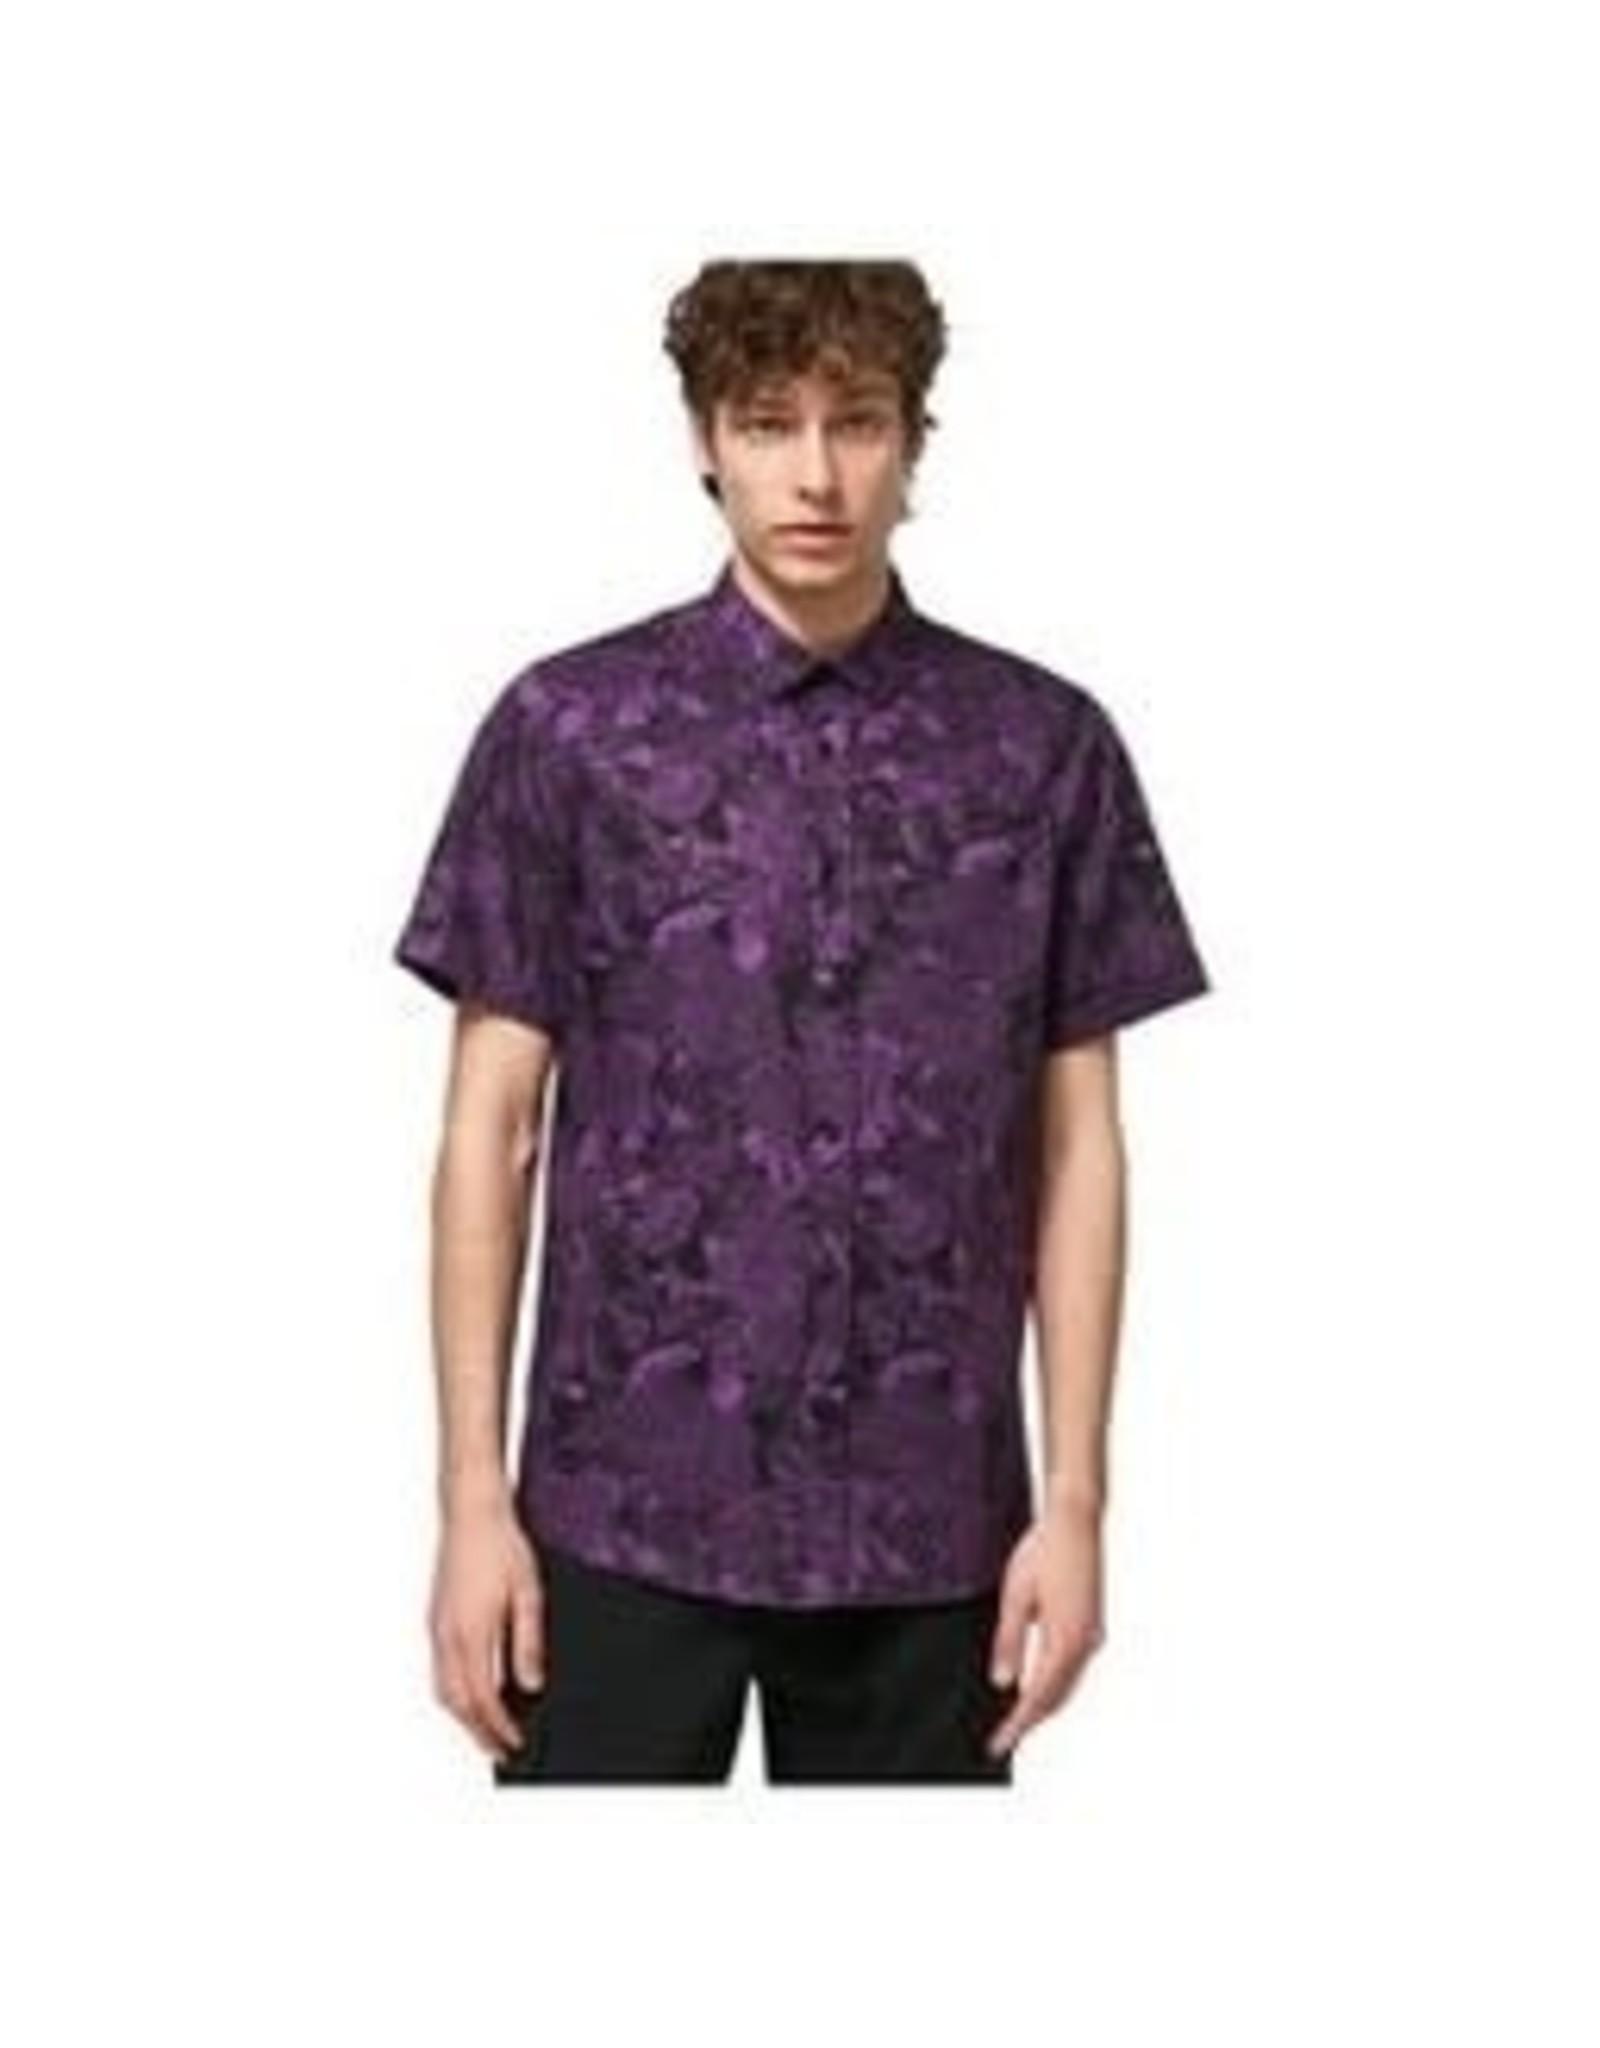 OAKLEY All Over Dark Floral Shirt